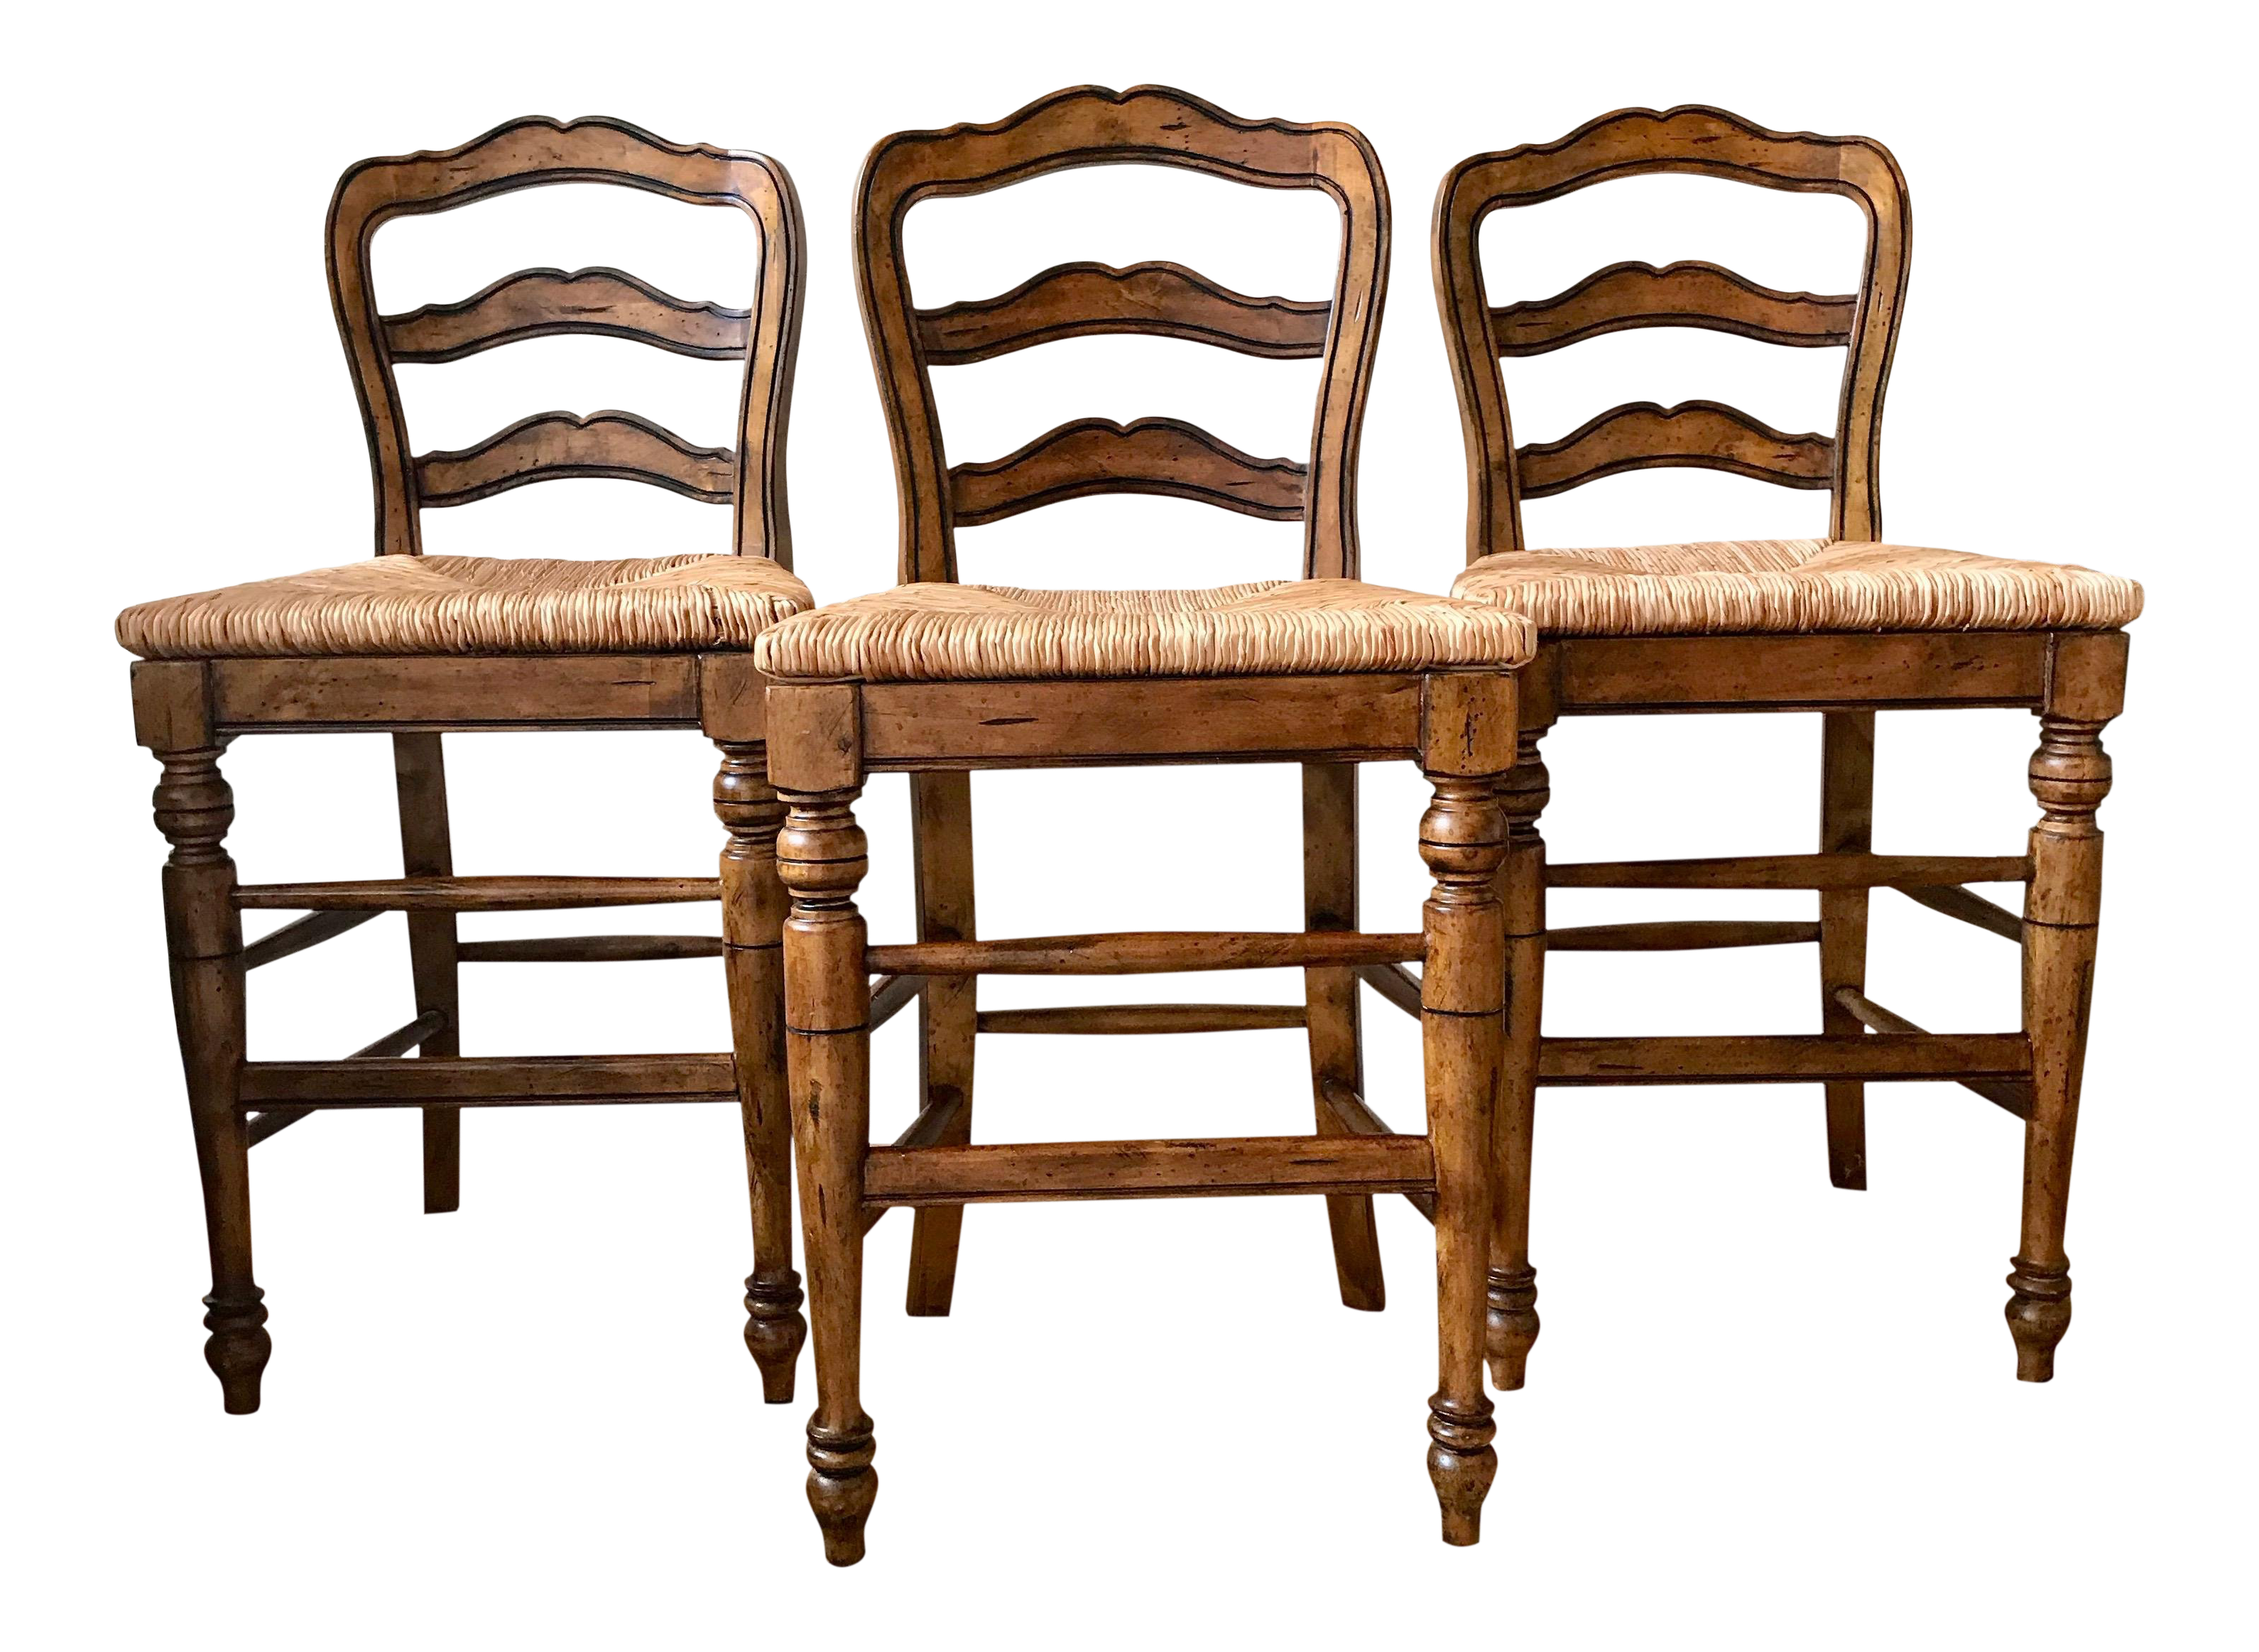 1990s vintage ballard designs avignon counter stools- set of 3